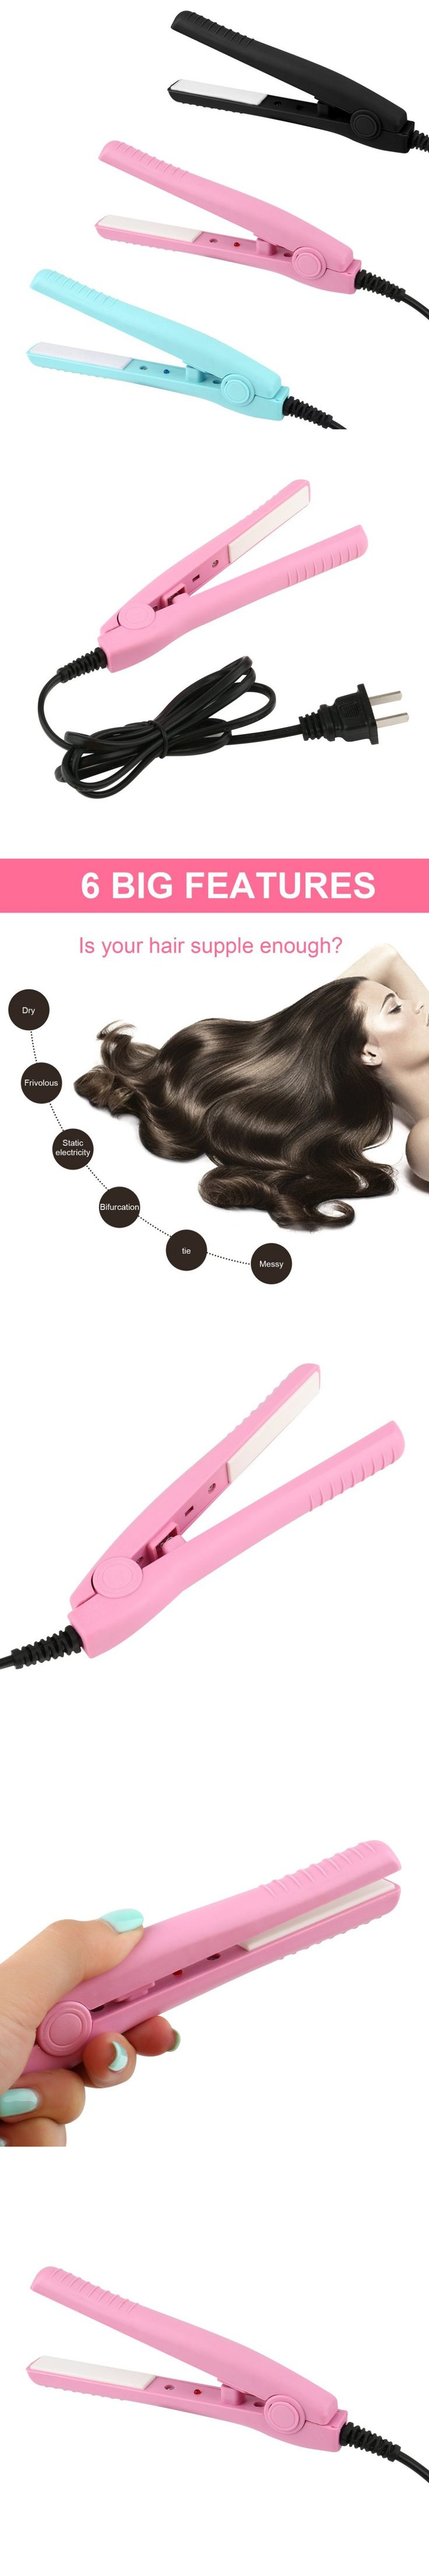 Mini Portable Electric Splint Flat Iron Ceramic Hair Curler & Straightener Hair Perming Hair Styling Appliance Hair Crimper new